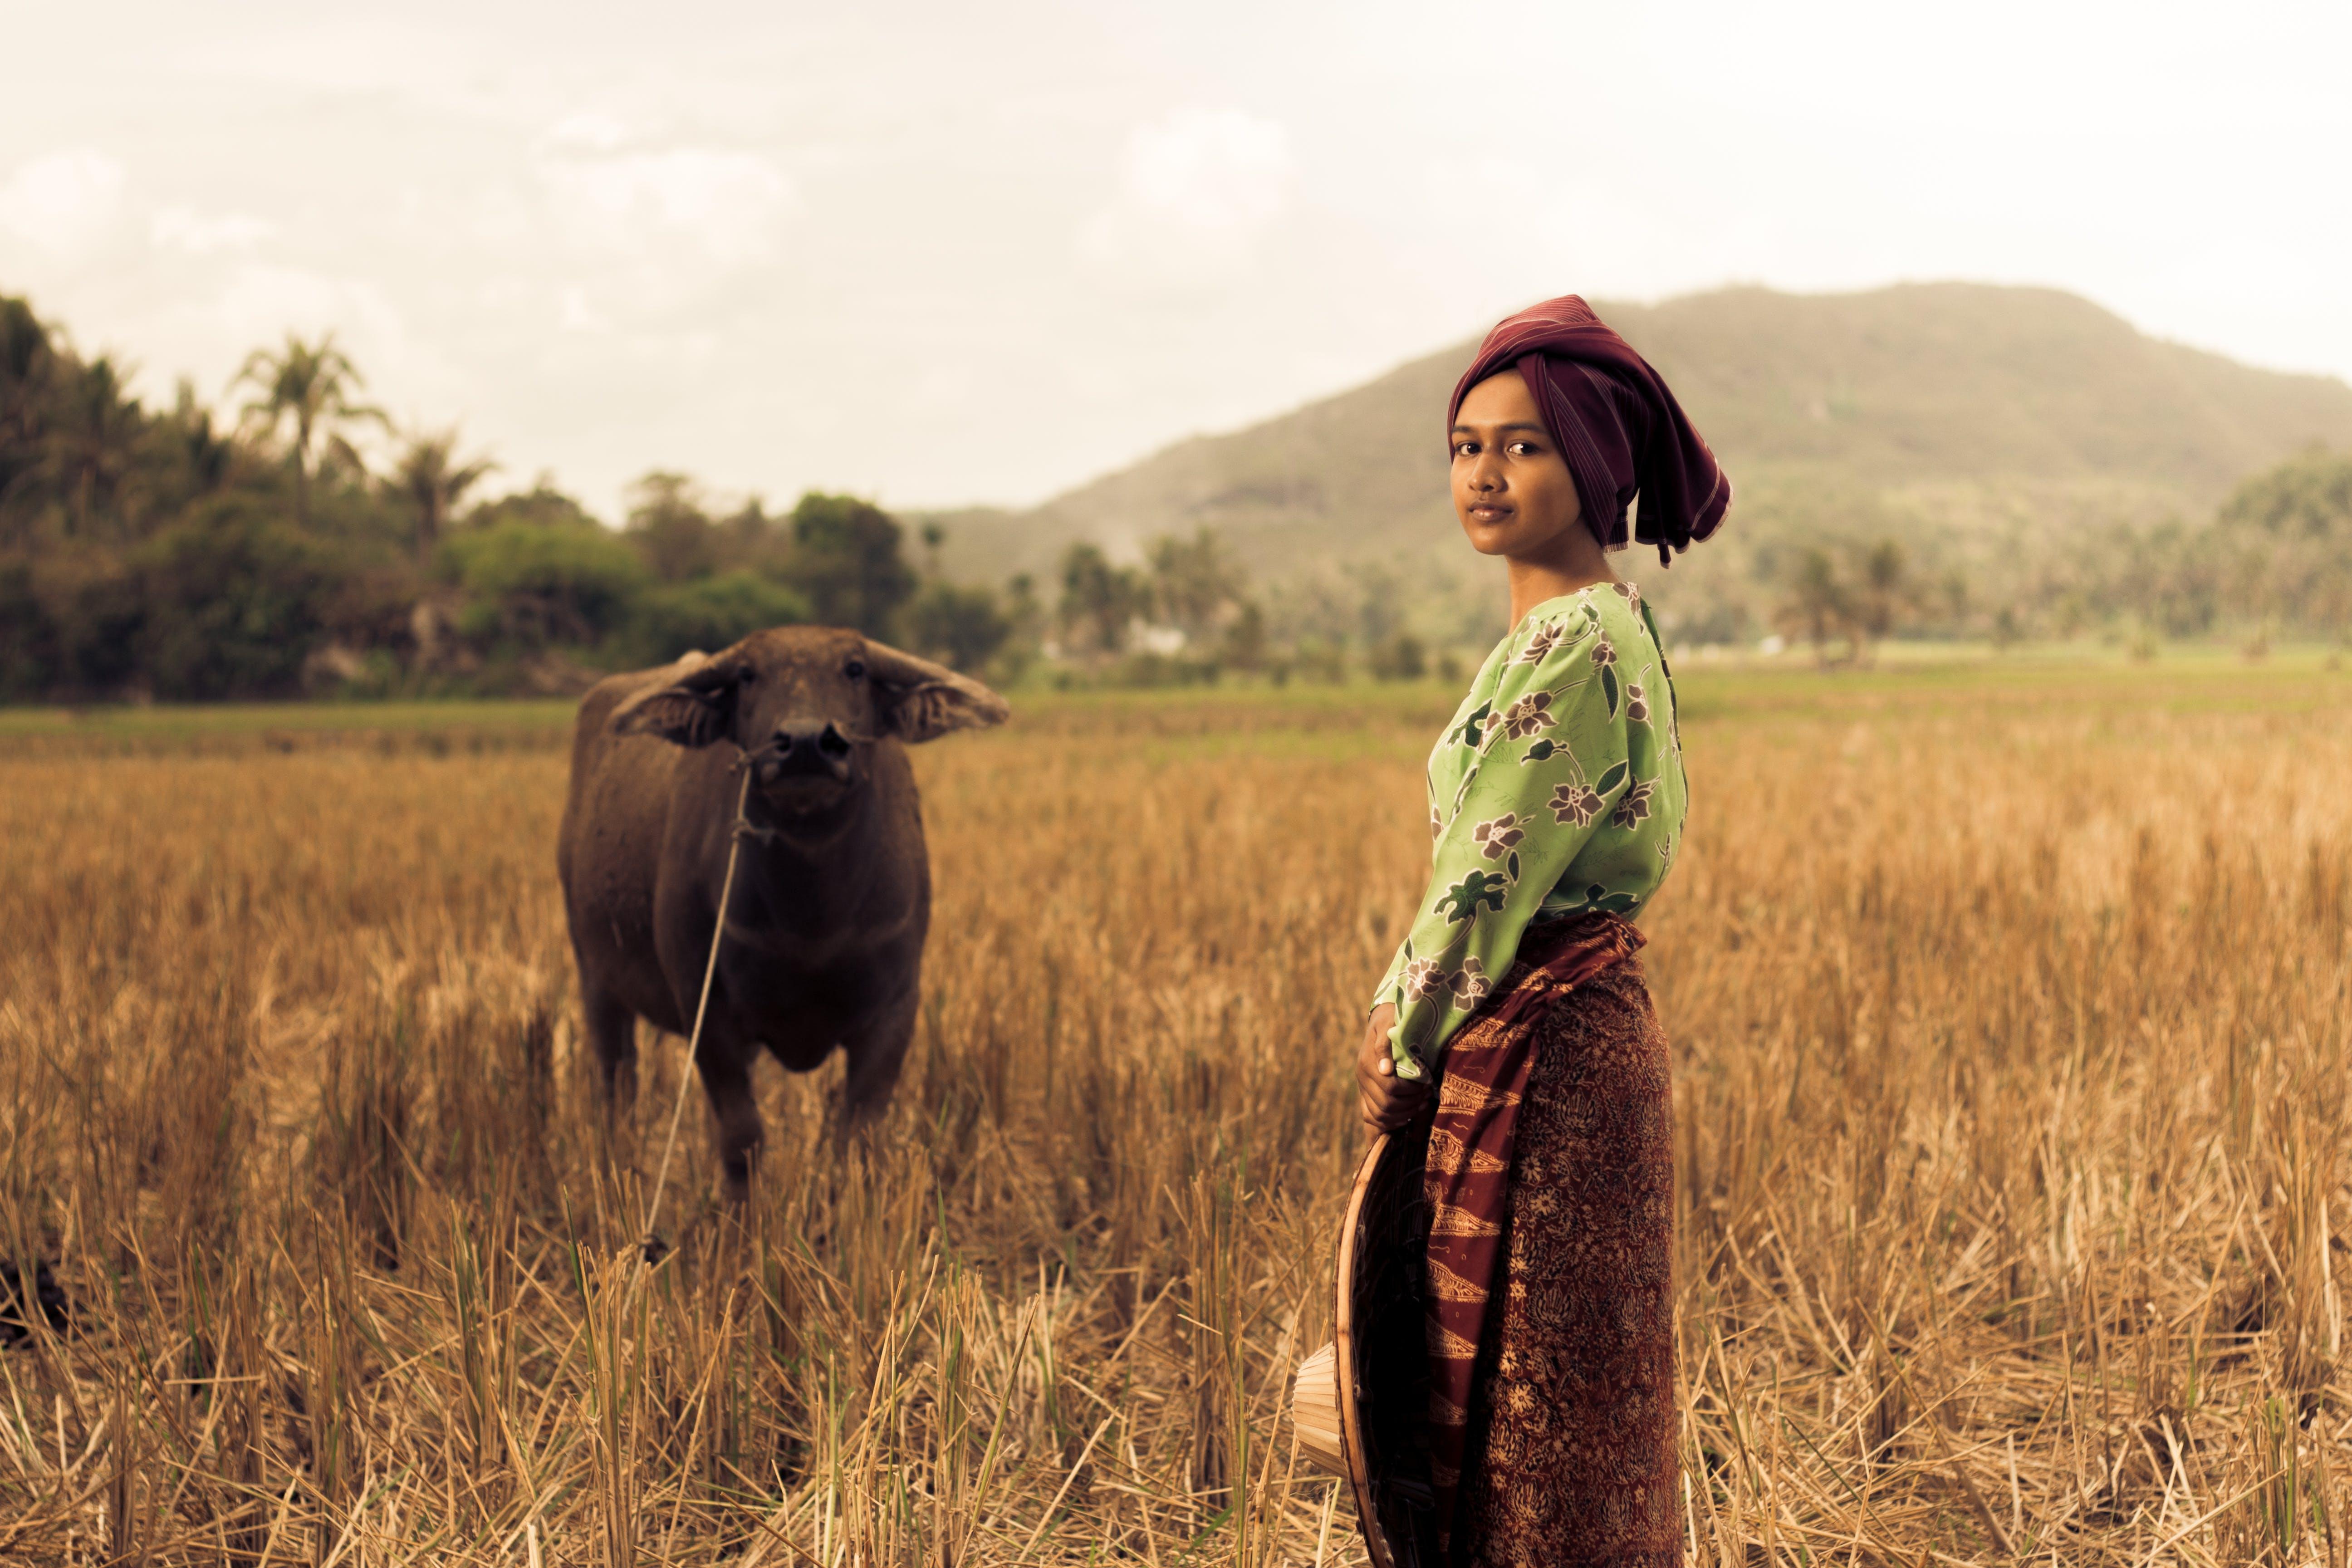 Woman Standing Near Black Water Buffalo at the Field